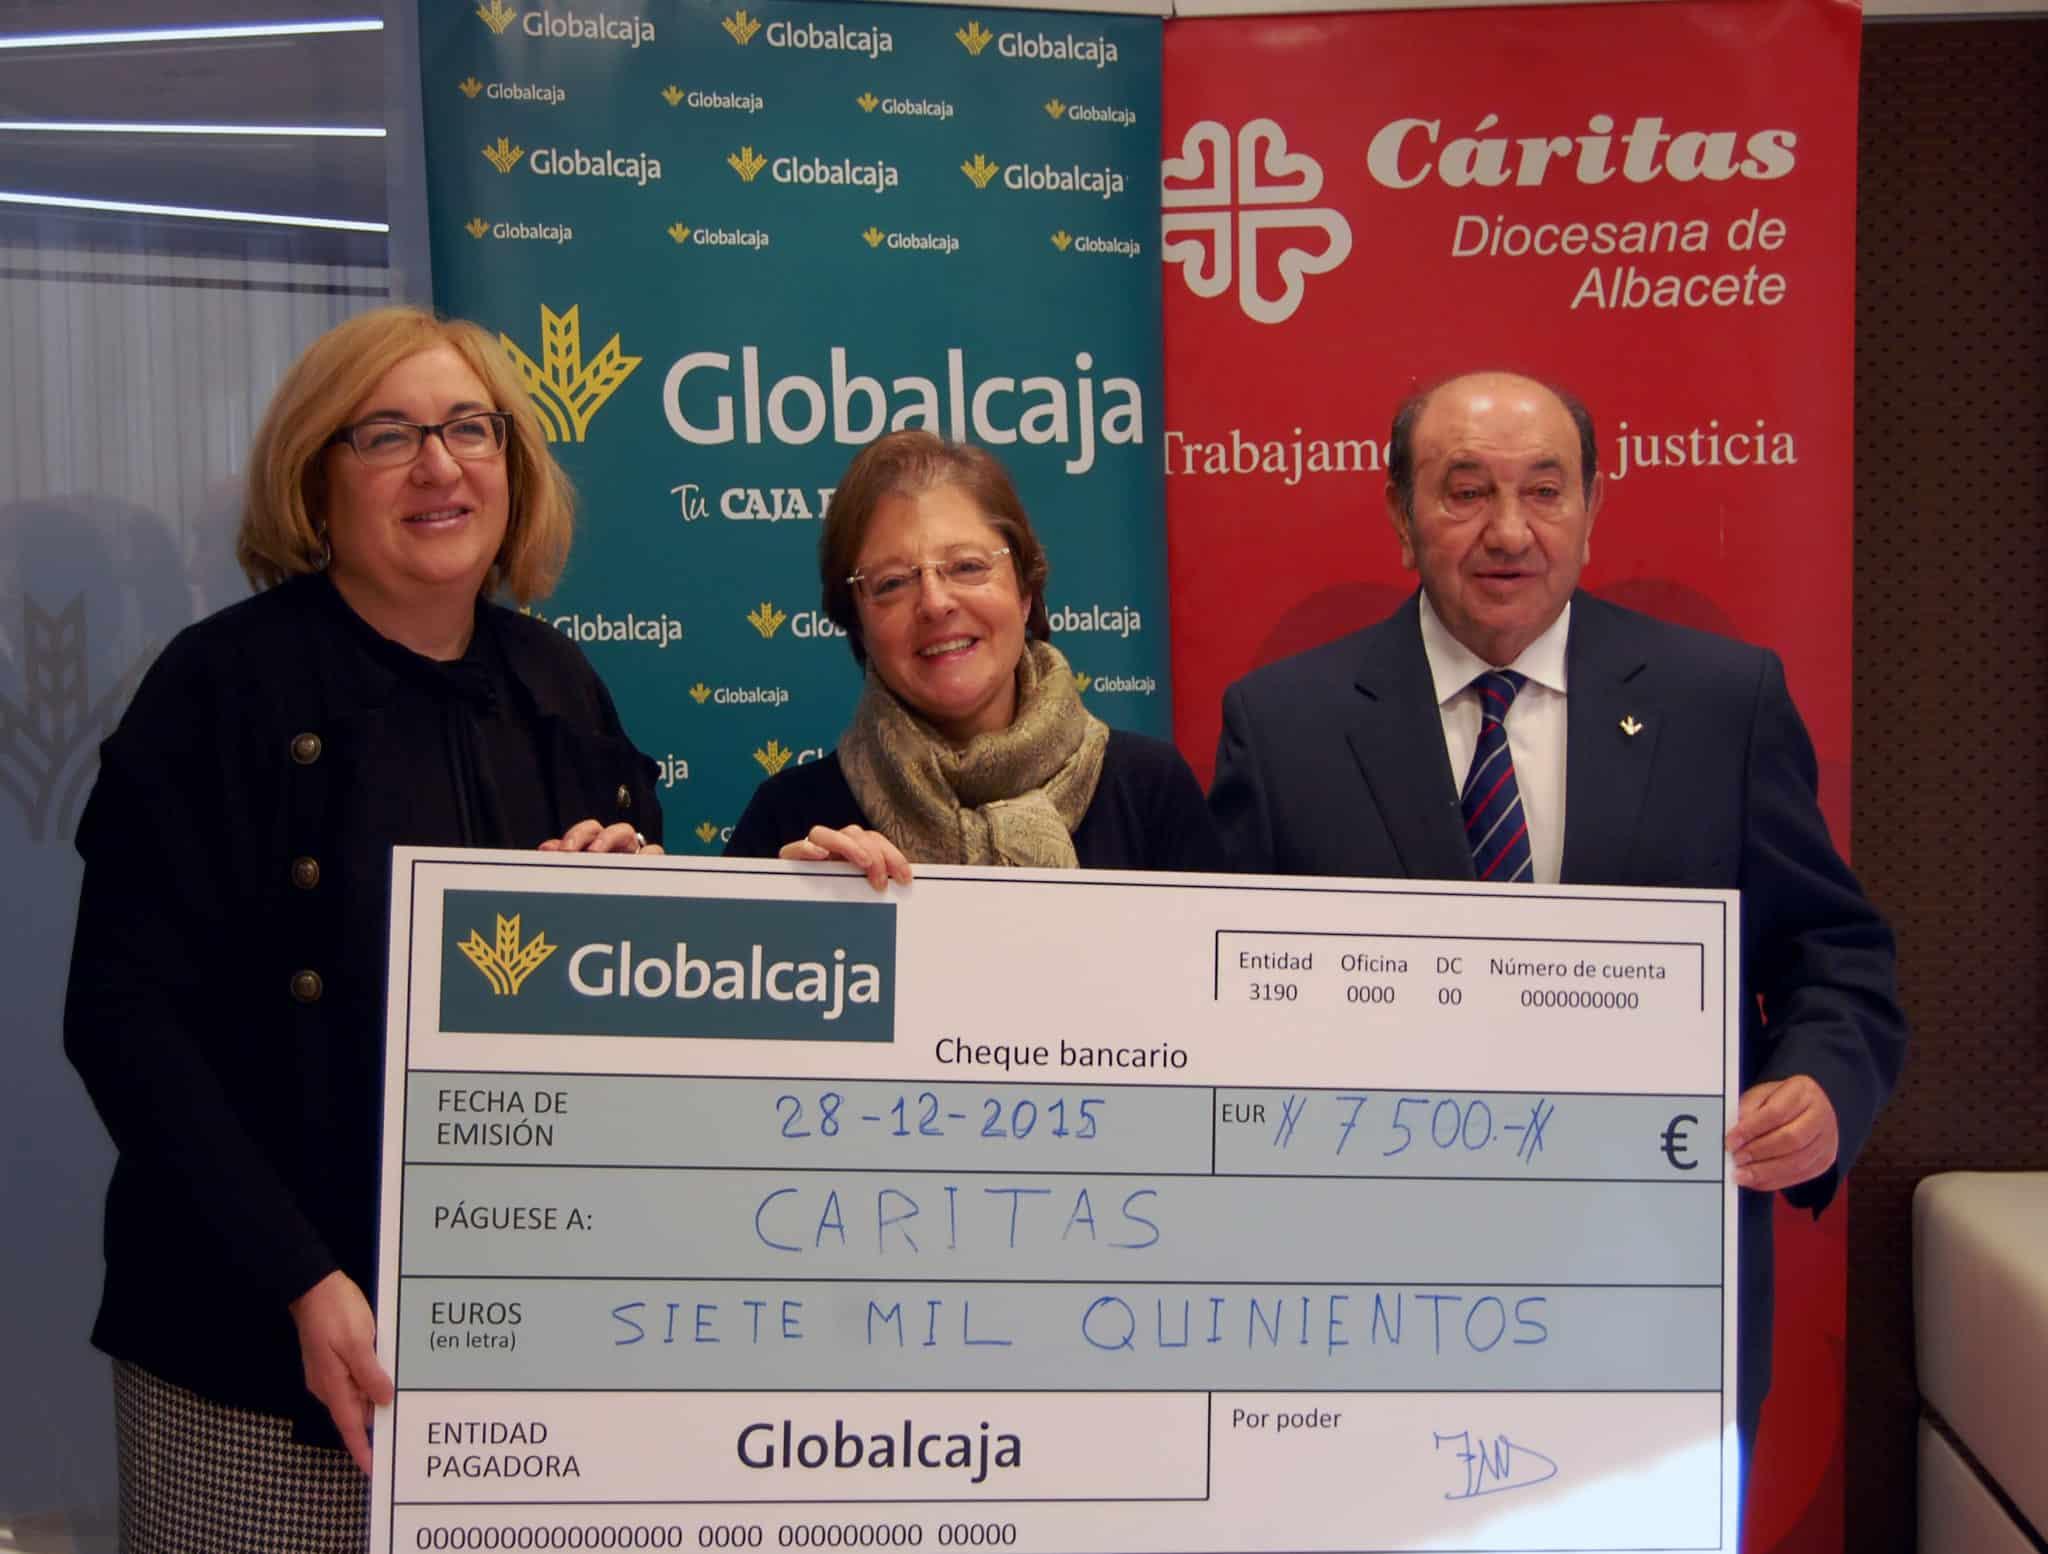 https://blog.globalcaja.es/wp-content/uploads/2015/12/higinio-globalcaja-.jpg